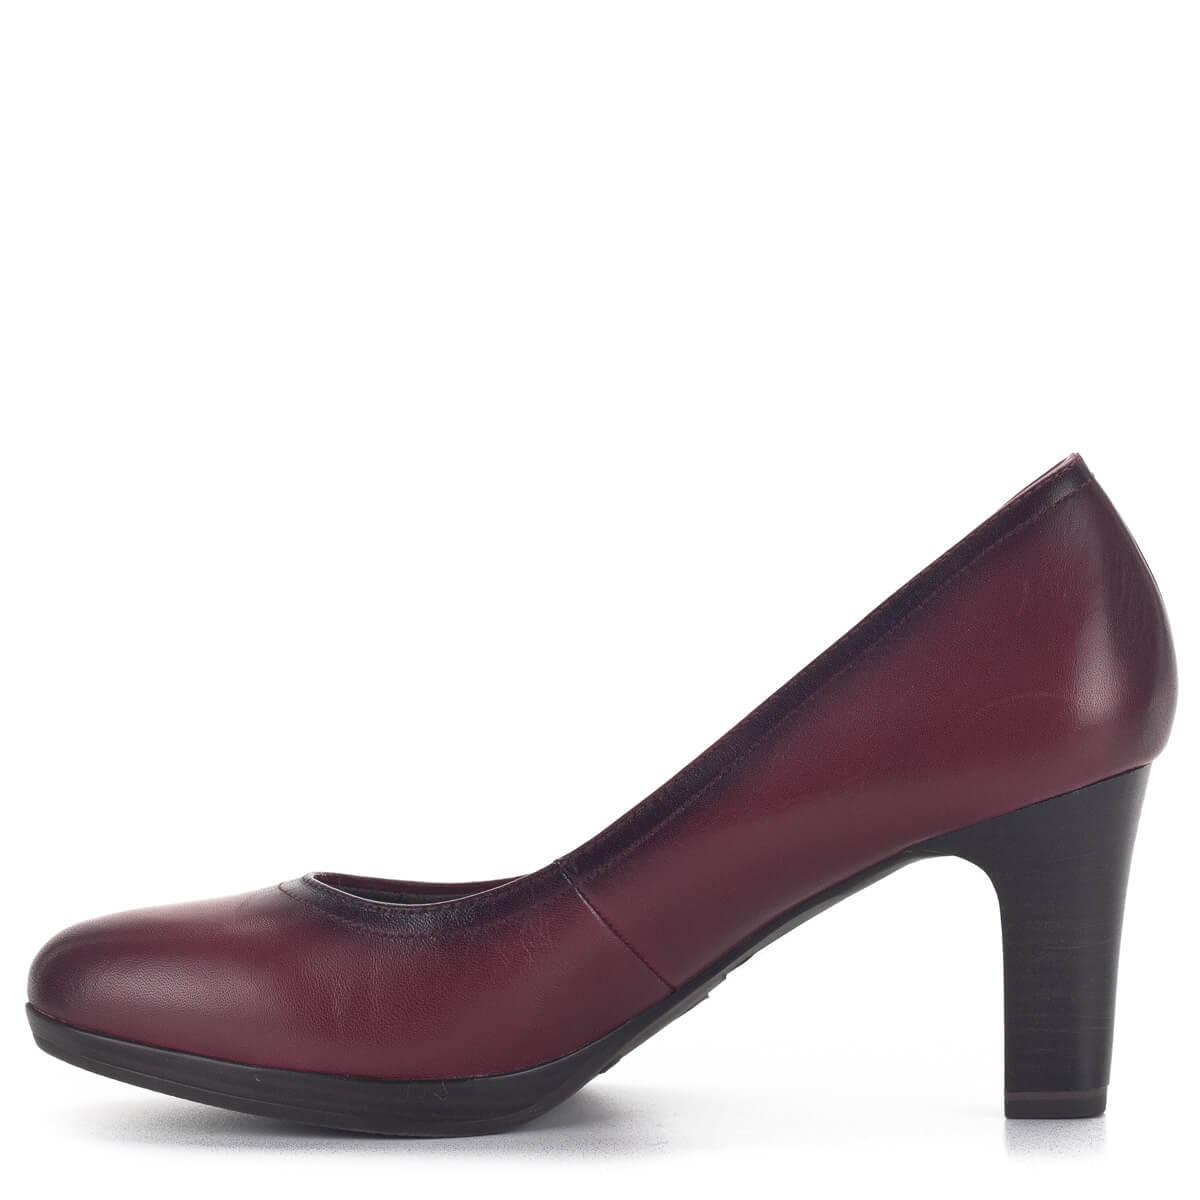 Tamaris cipő Bordó bőr magassarkú Tamaris cipő 1 22410